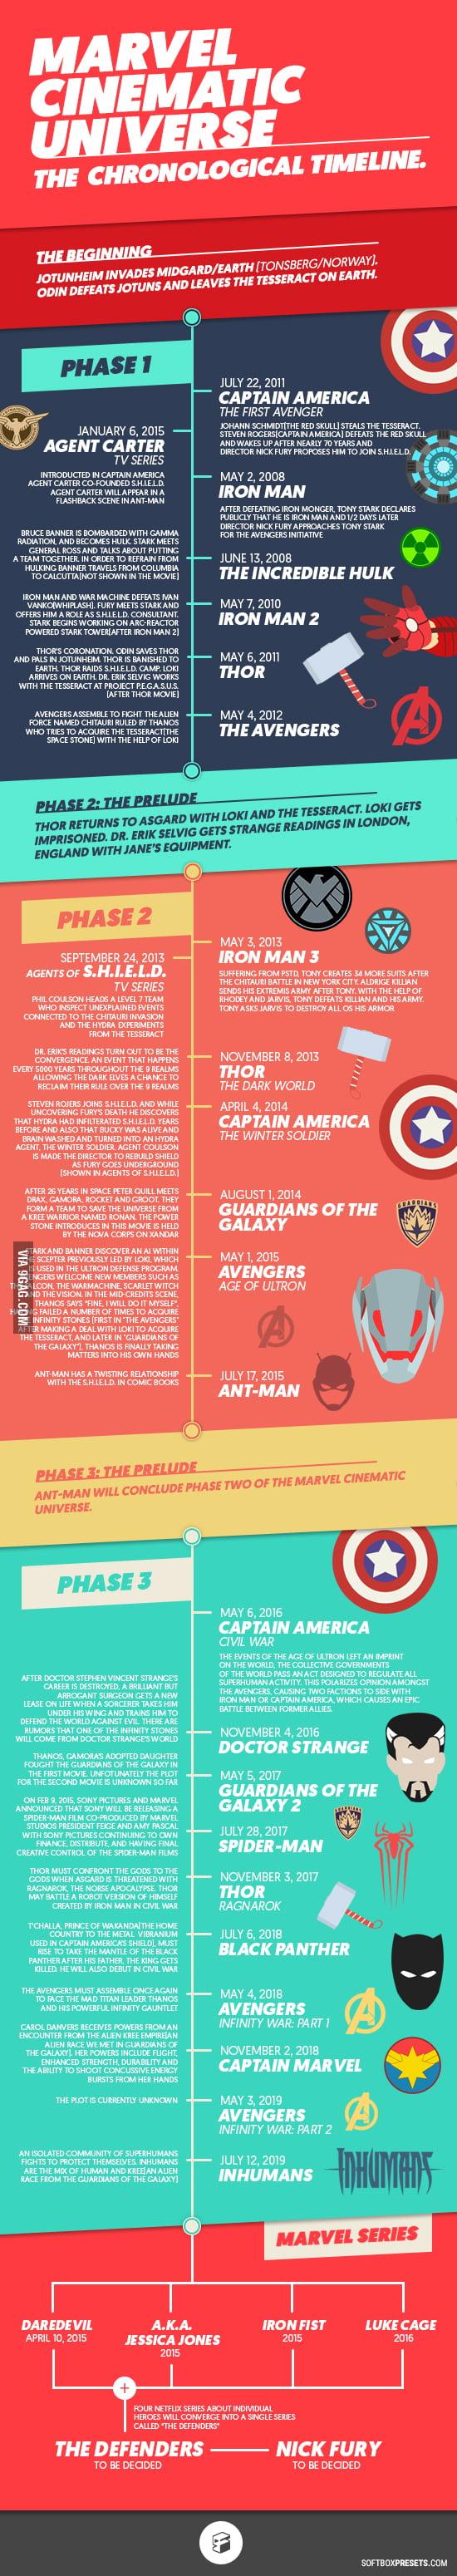 Marvel Cinematic Universe - The Chronological Timeline - 9GAG